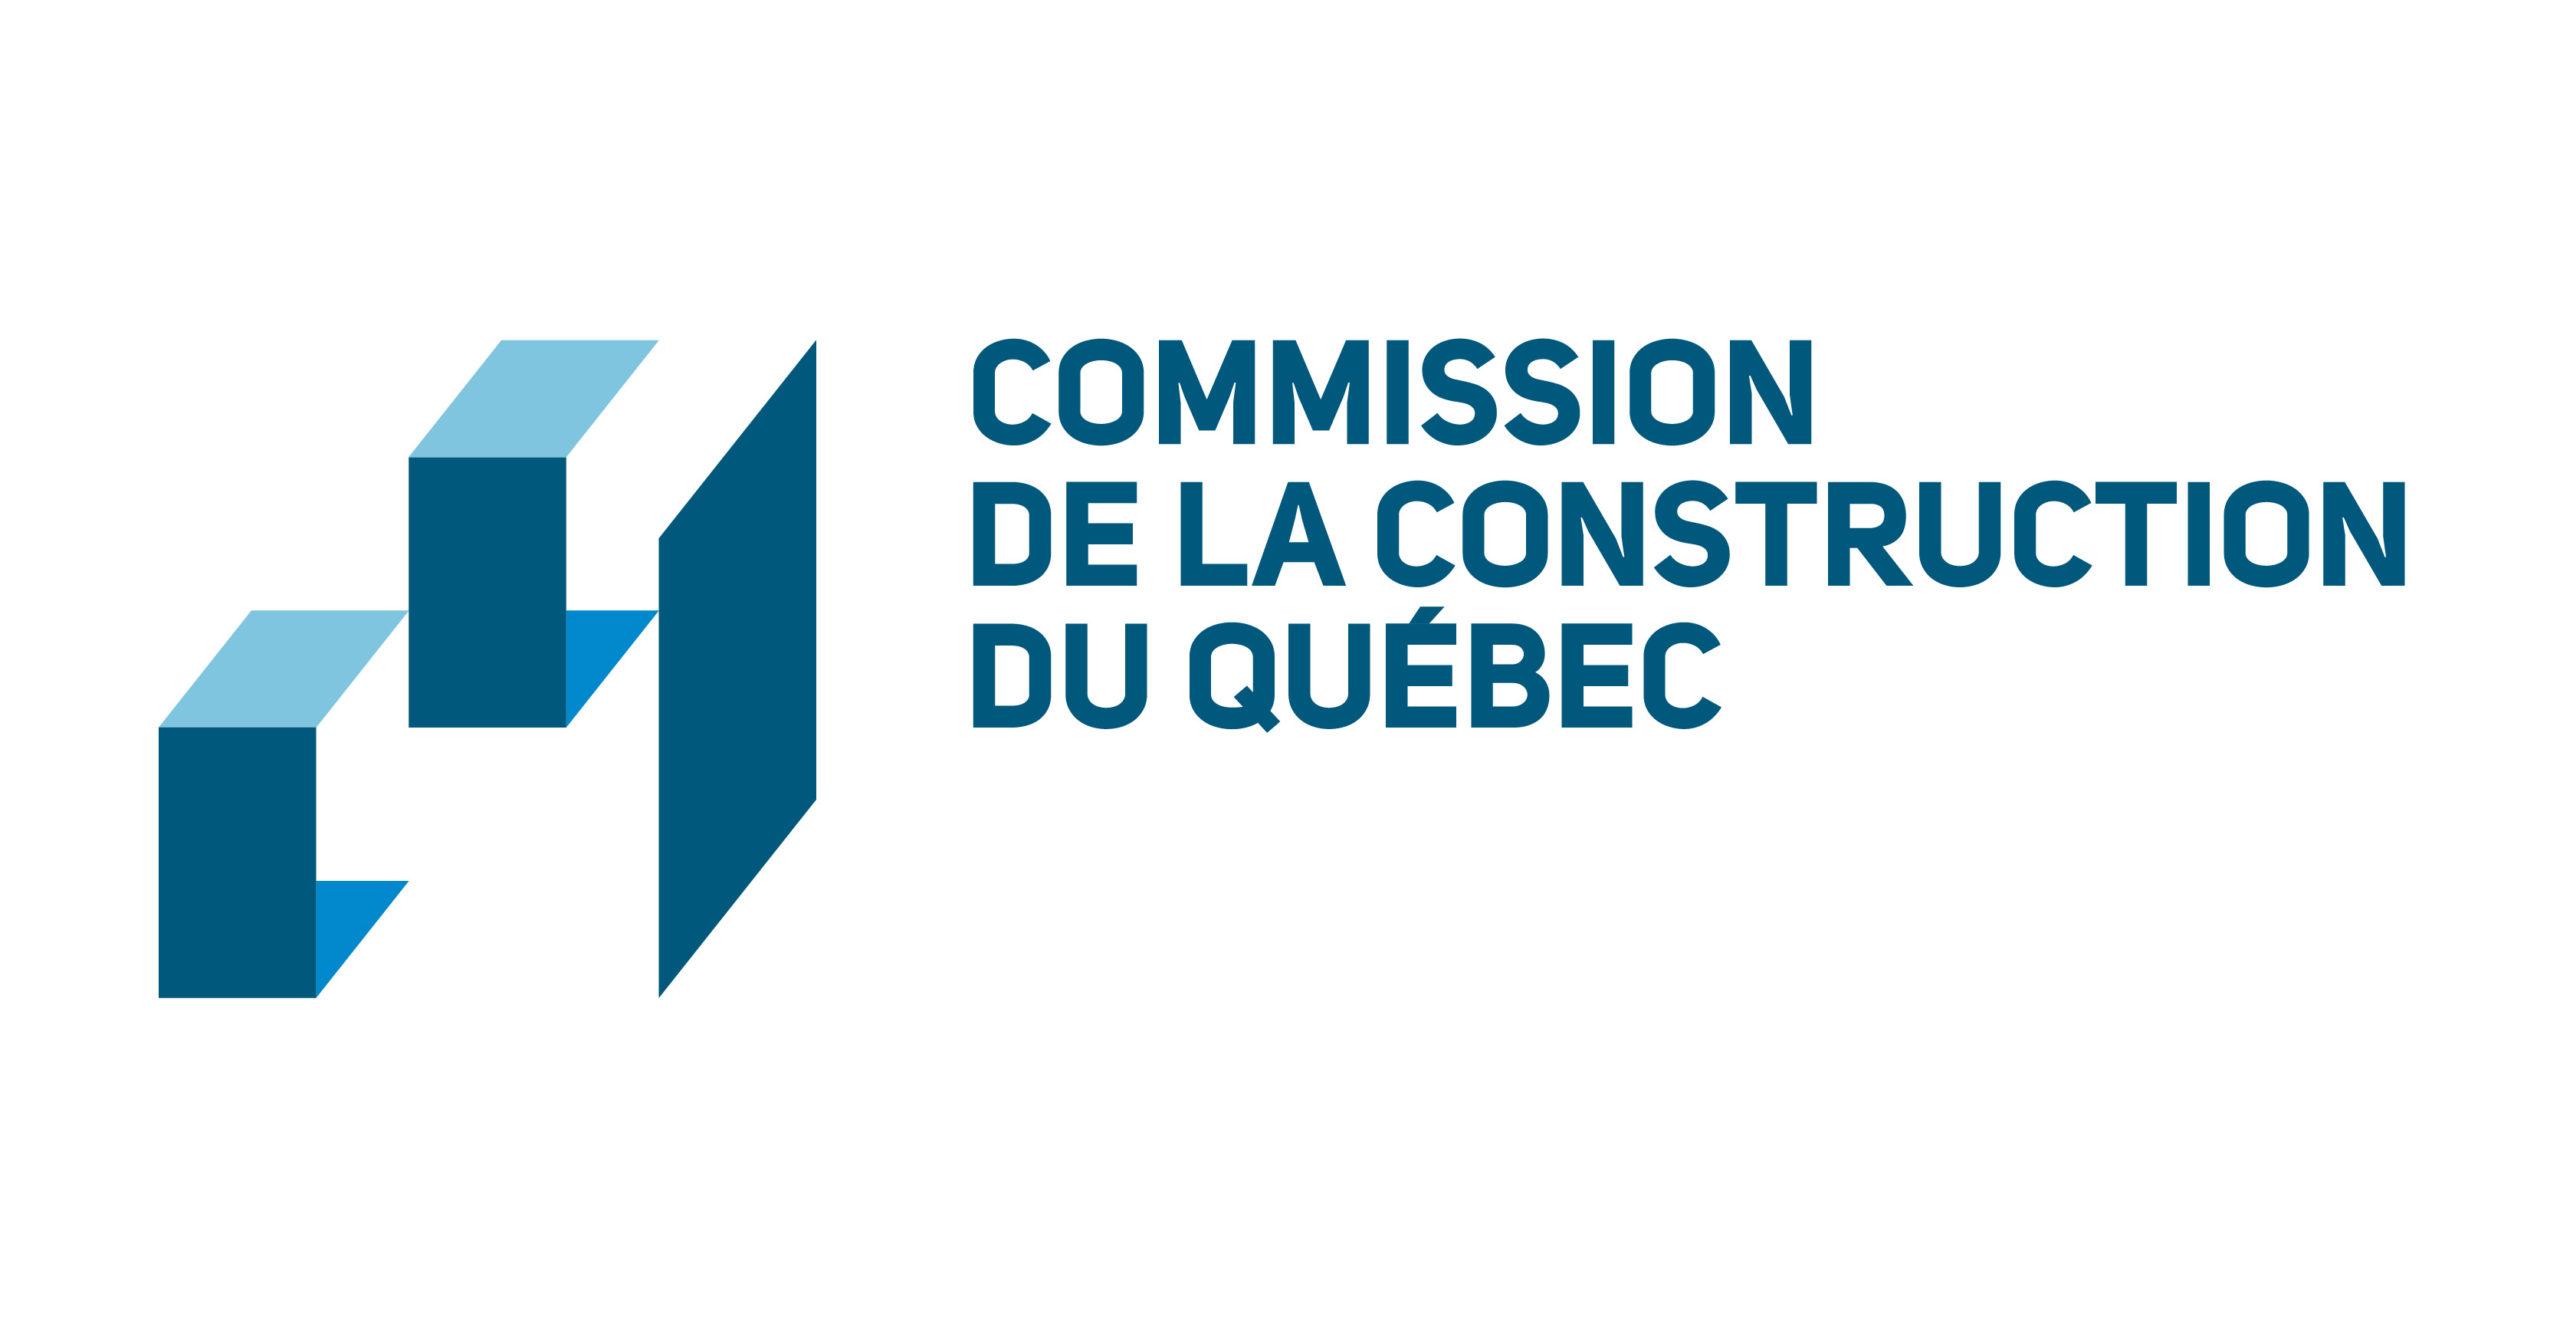 Logo du partenaire http://www.ccq.org/fr-CA/Accueil?profil=GrandPublic